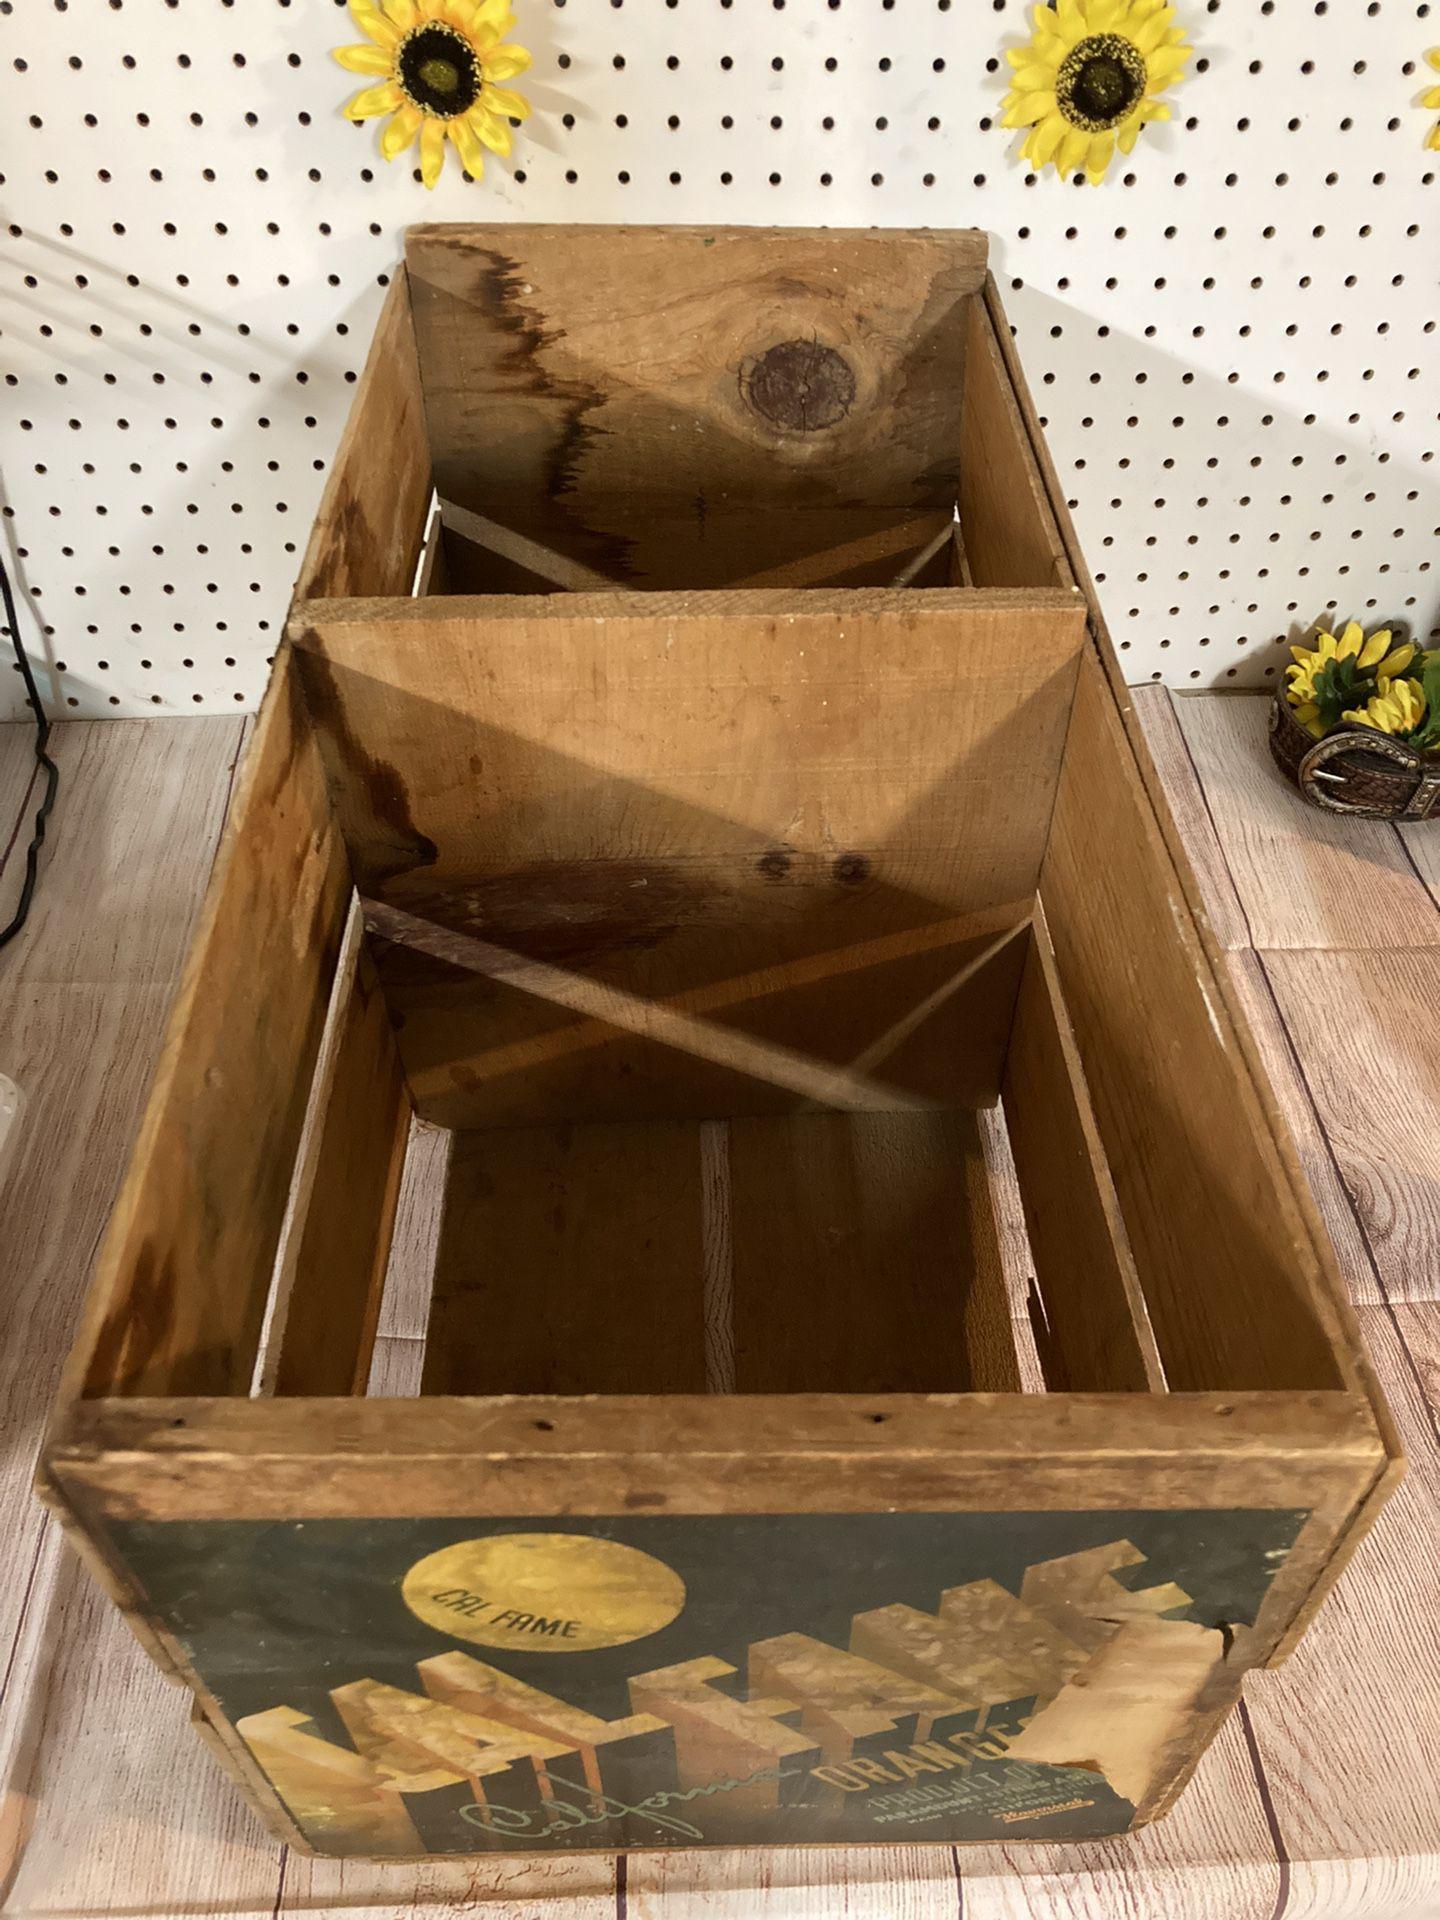 CalFame Oranges Vintage Crate!